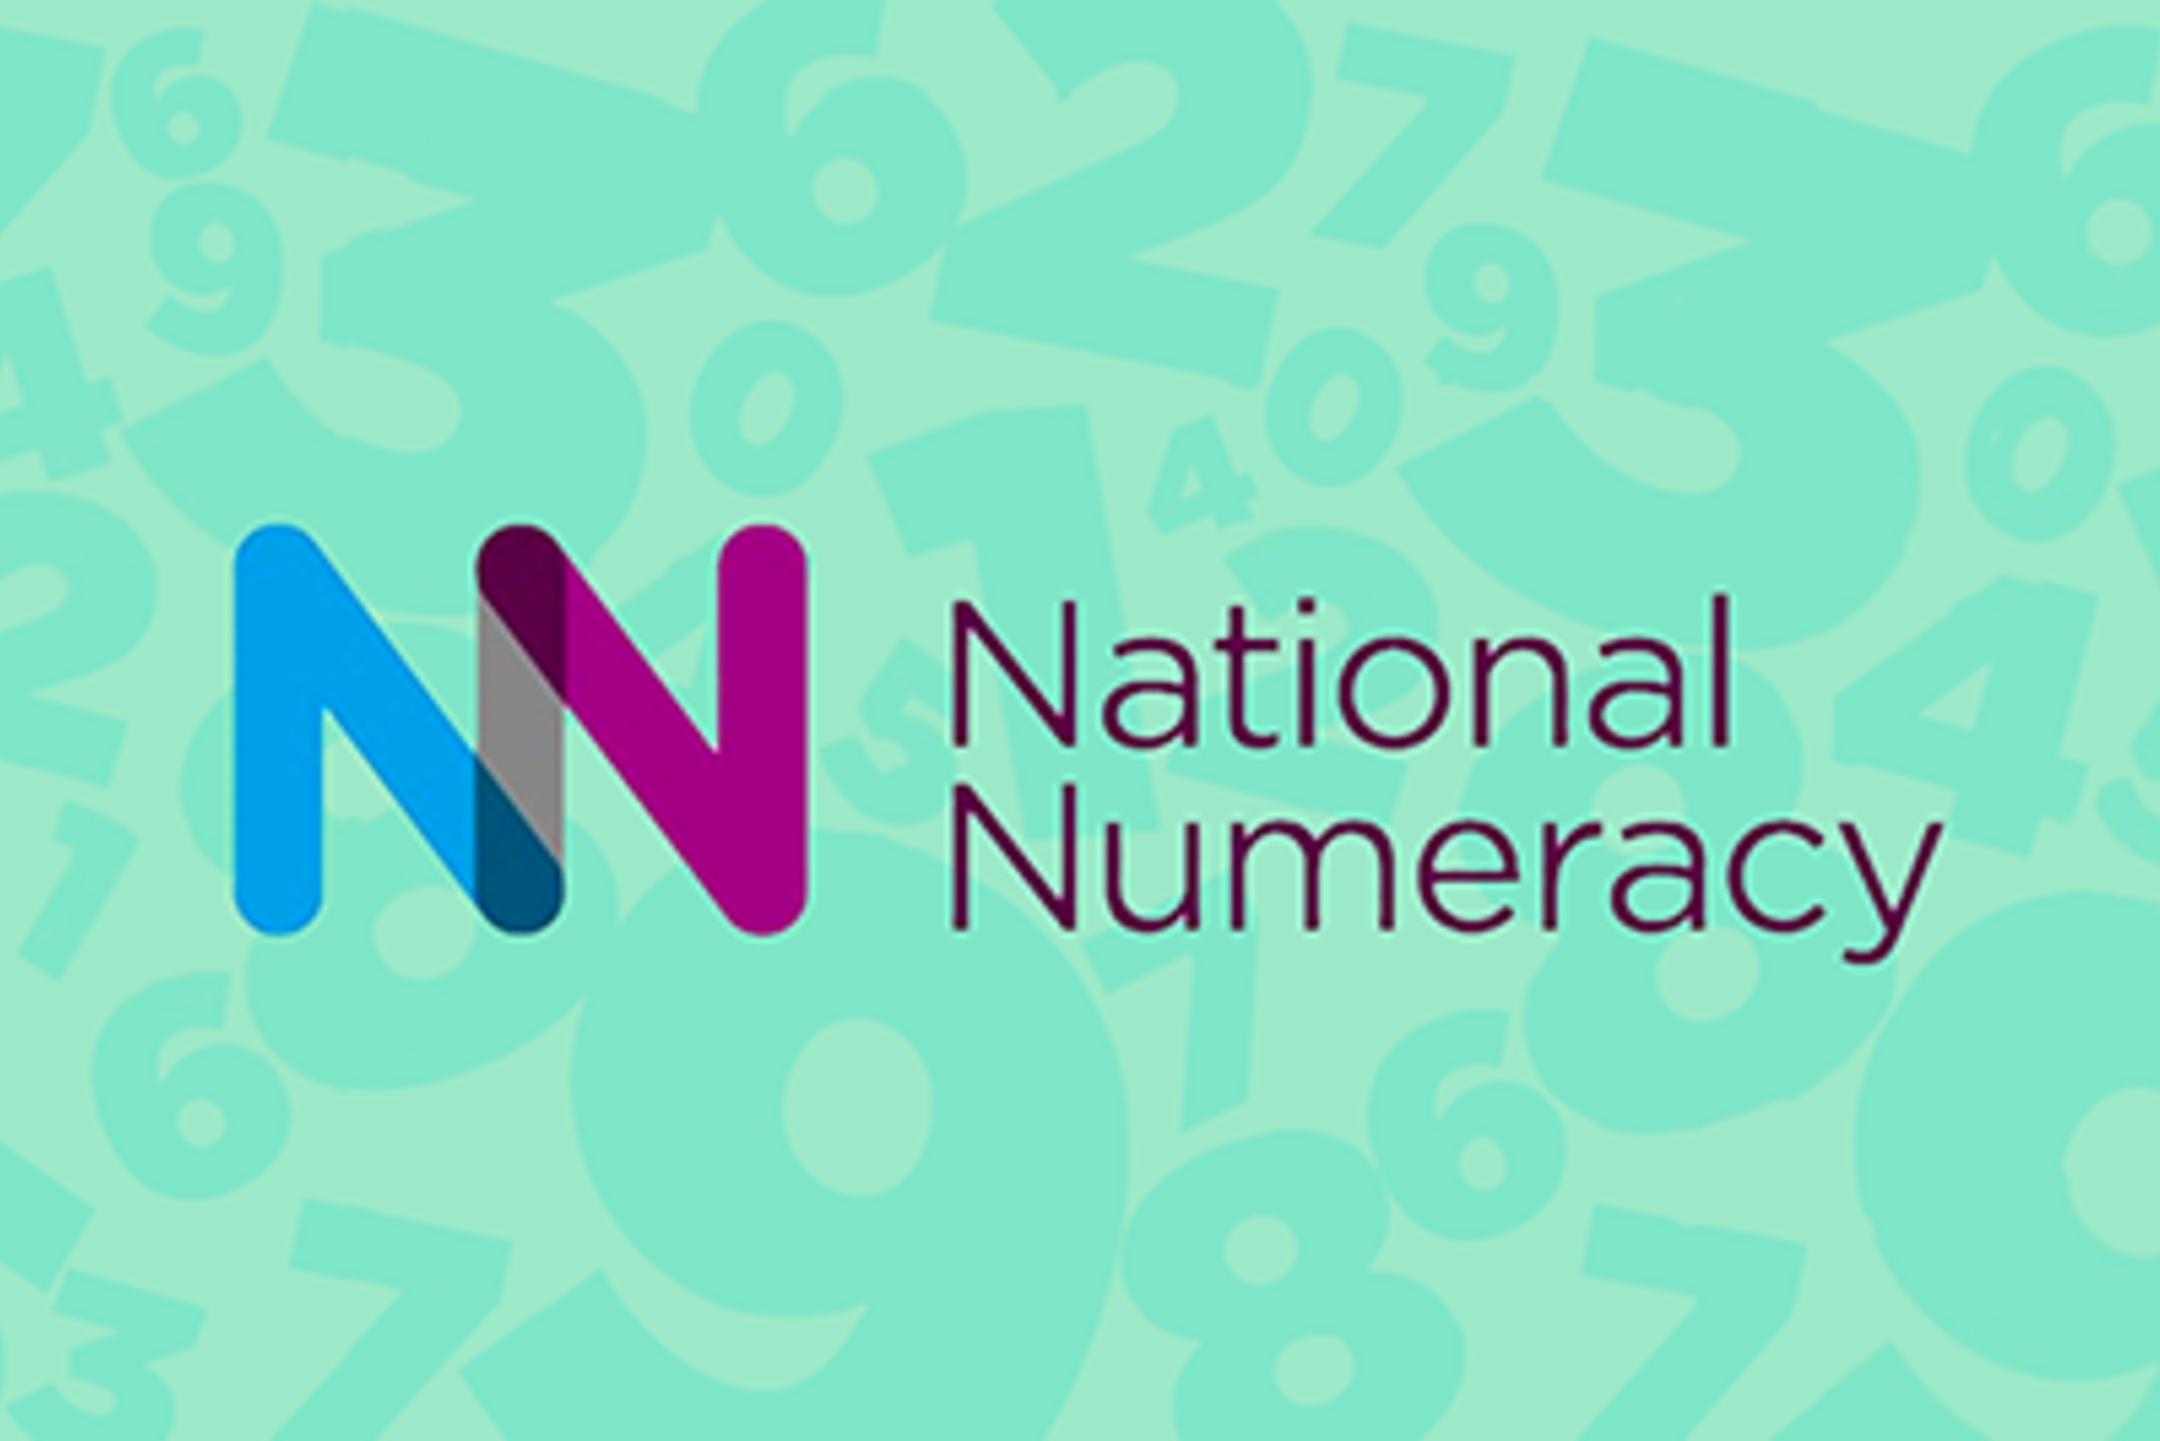 National Numeracy logo on green background.